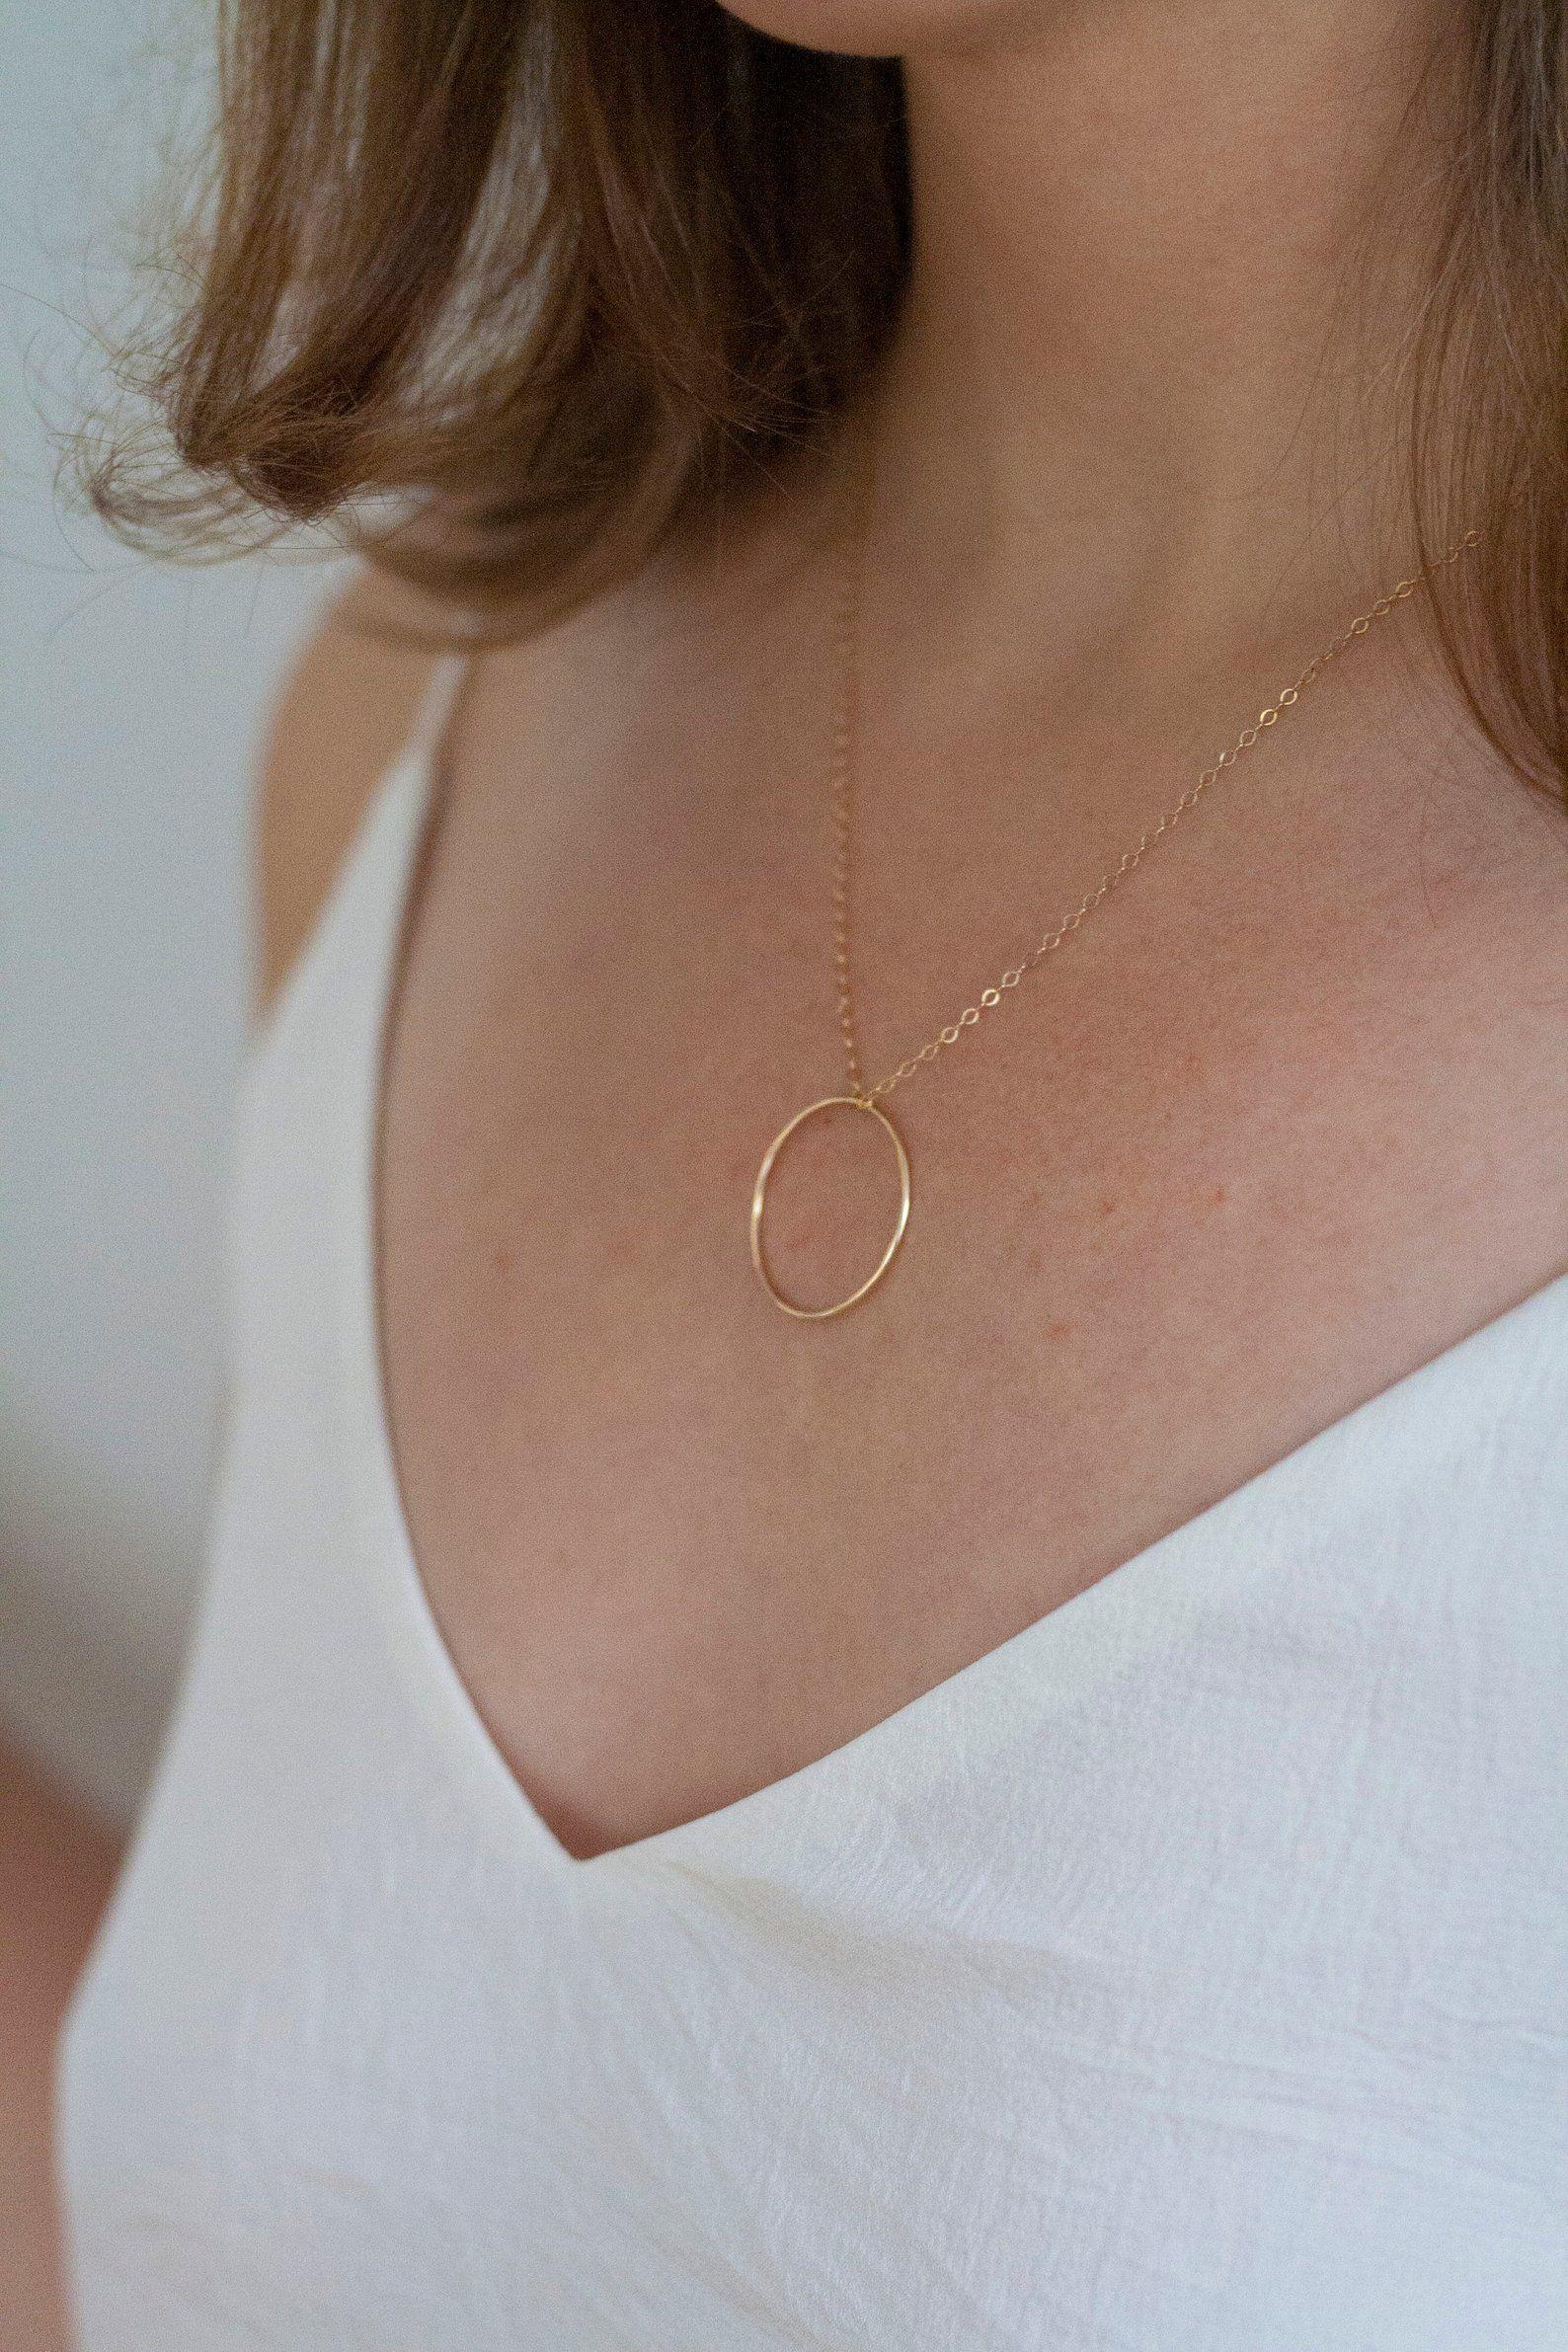 10 Minimalist Necklace 14k Gold Filled Hoop Necklace Etsy Minimalist Necklace Necklace Horn Necklace